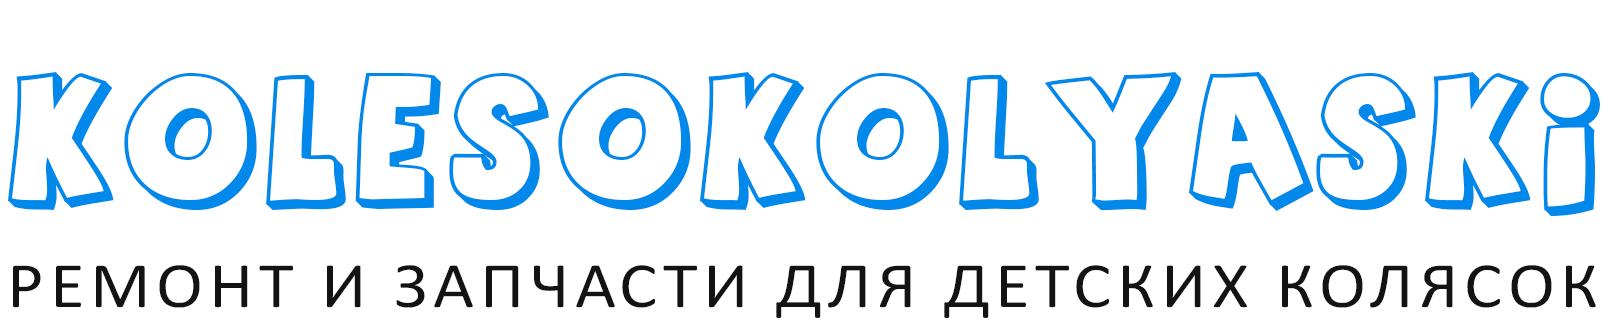 Kolesokolyaski.ru